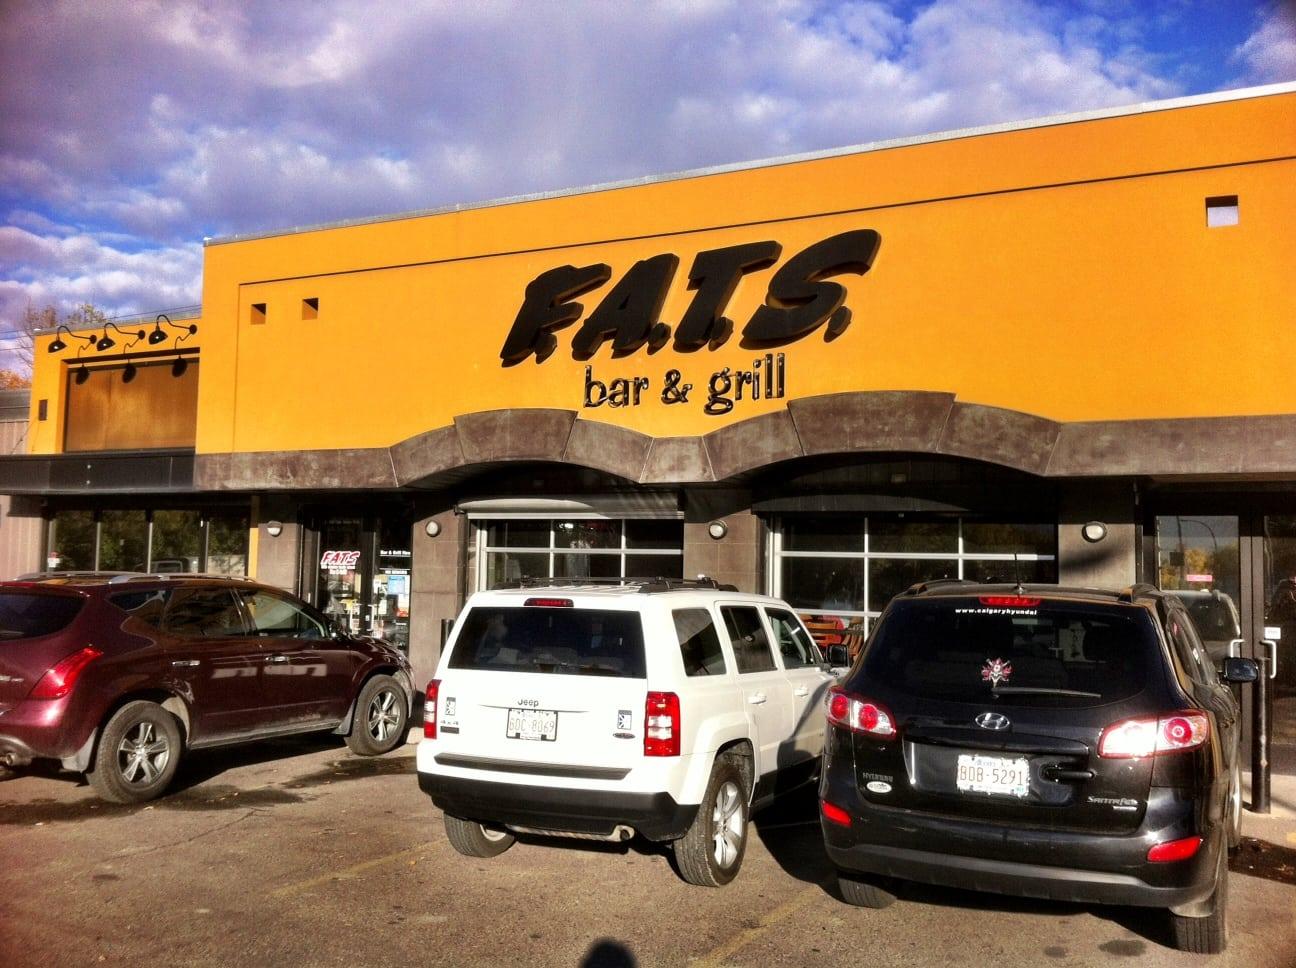 FATS Bar and Grill Kensington Calgary